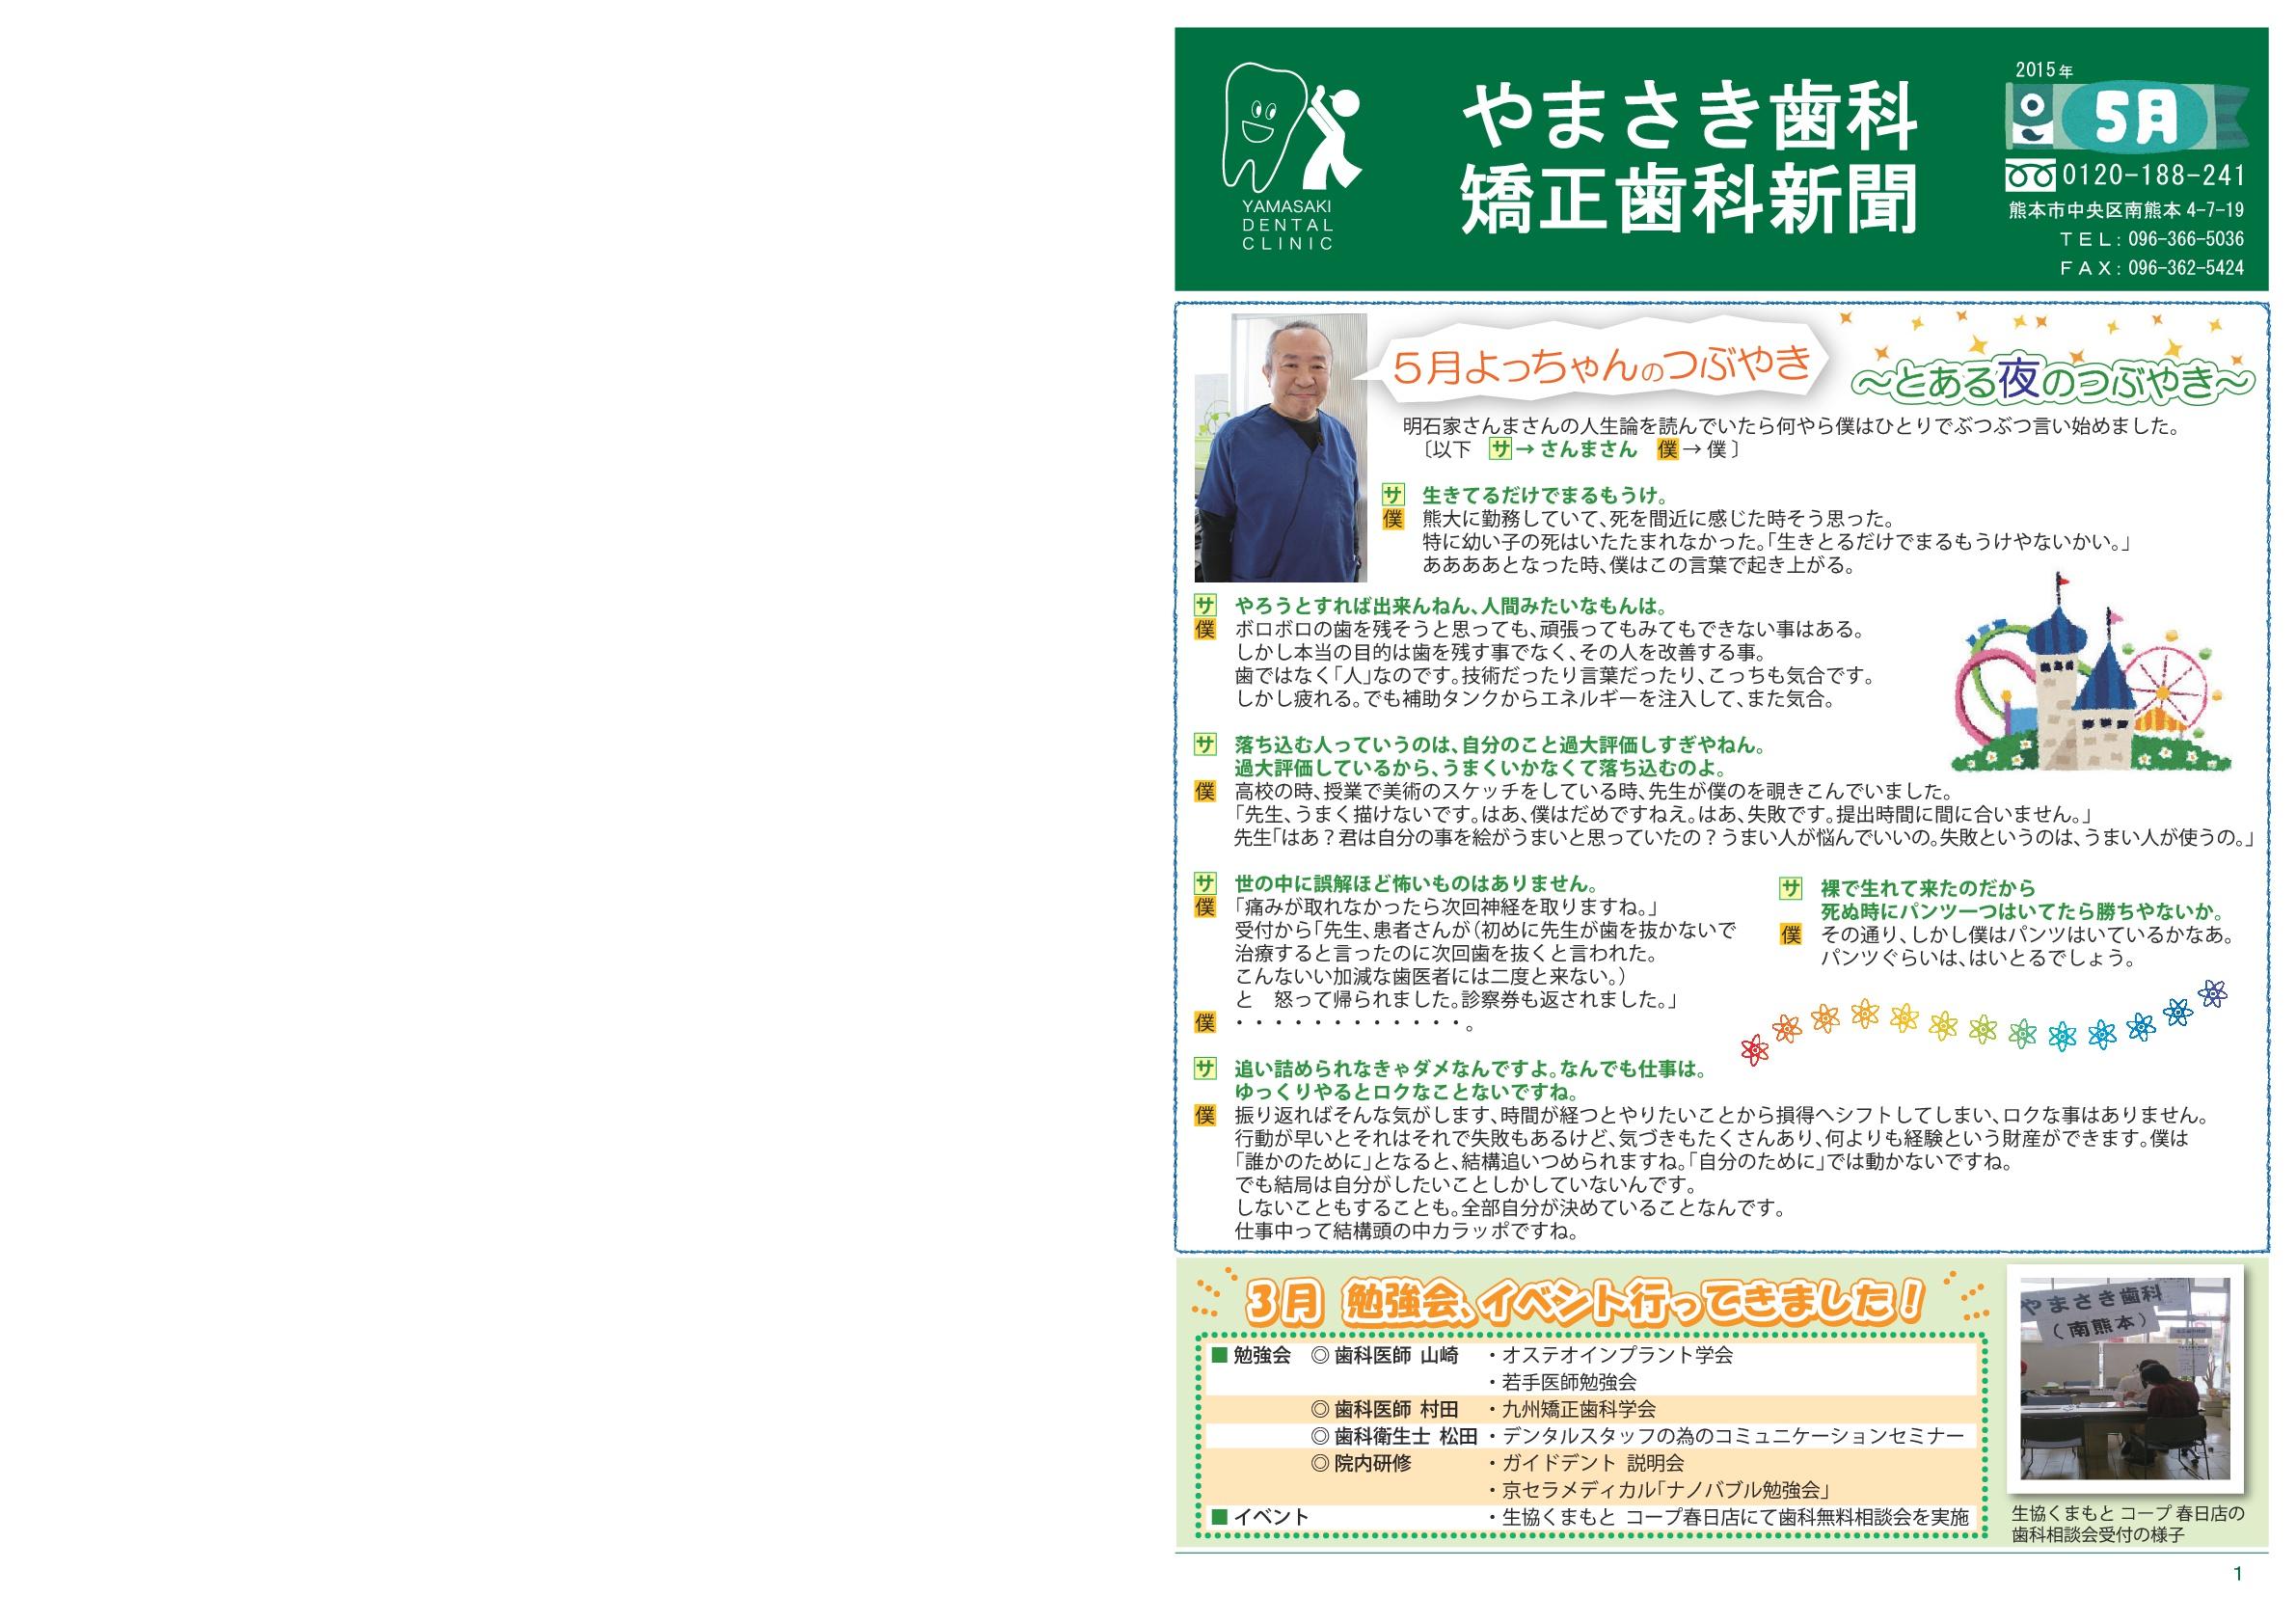 sinbun15-5-1-001